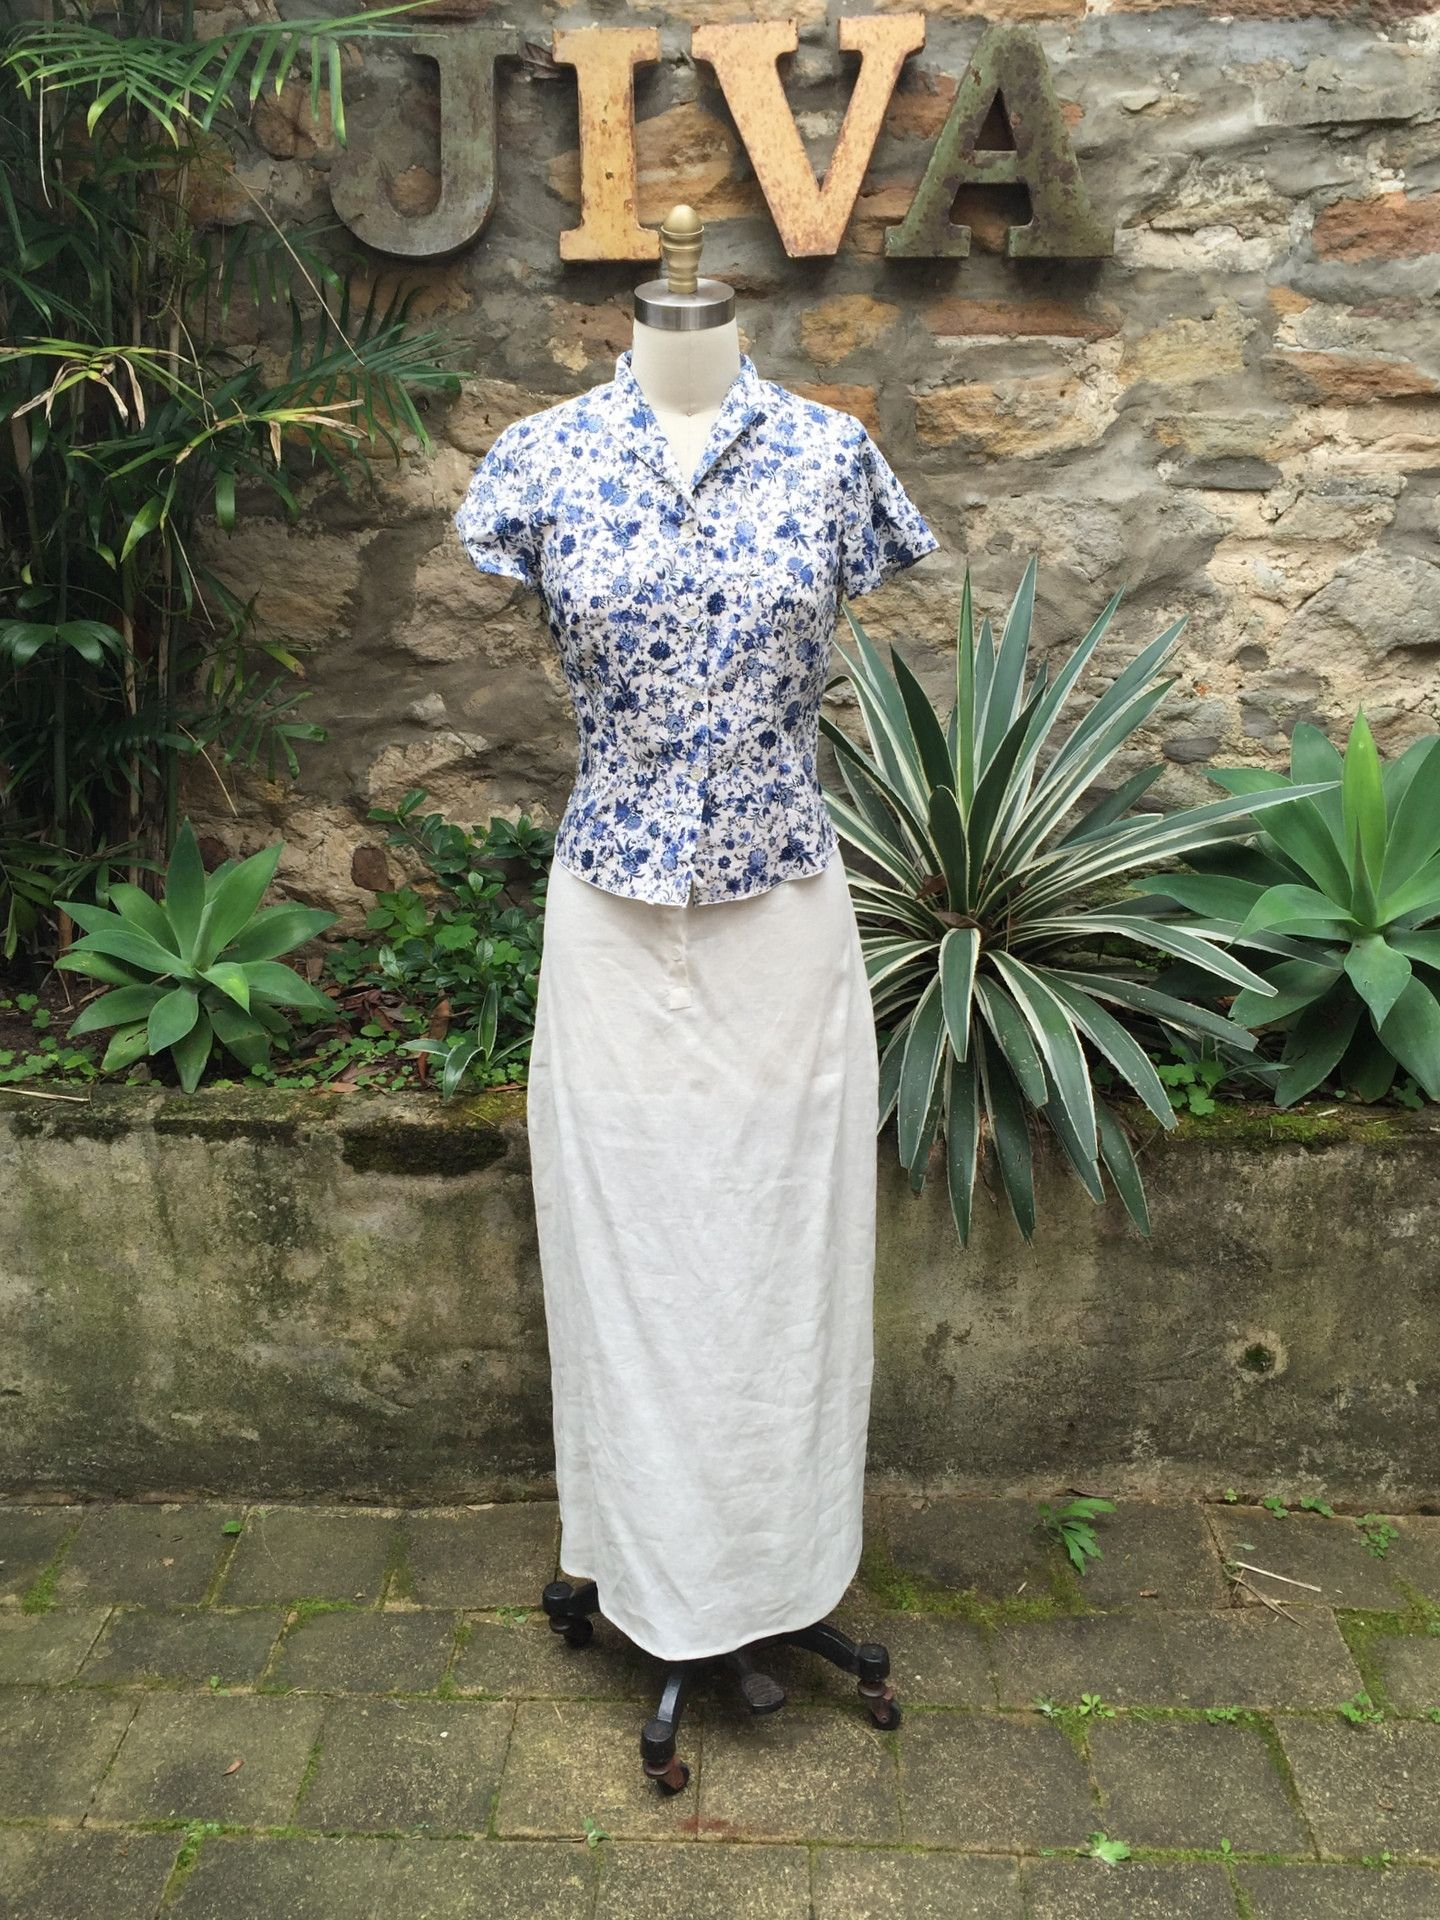 77724a0c05 Jiva Chelsea Shirt- Linen Blue Flower Print – Jiva Clothing Chelsea Shirt